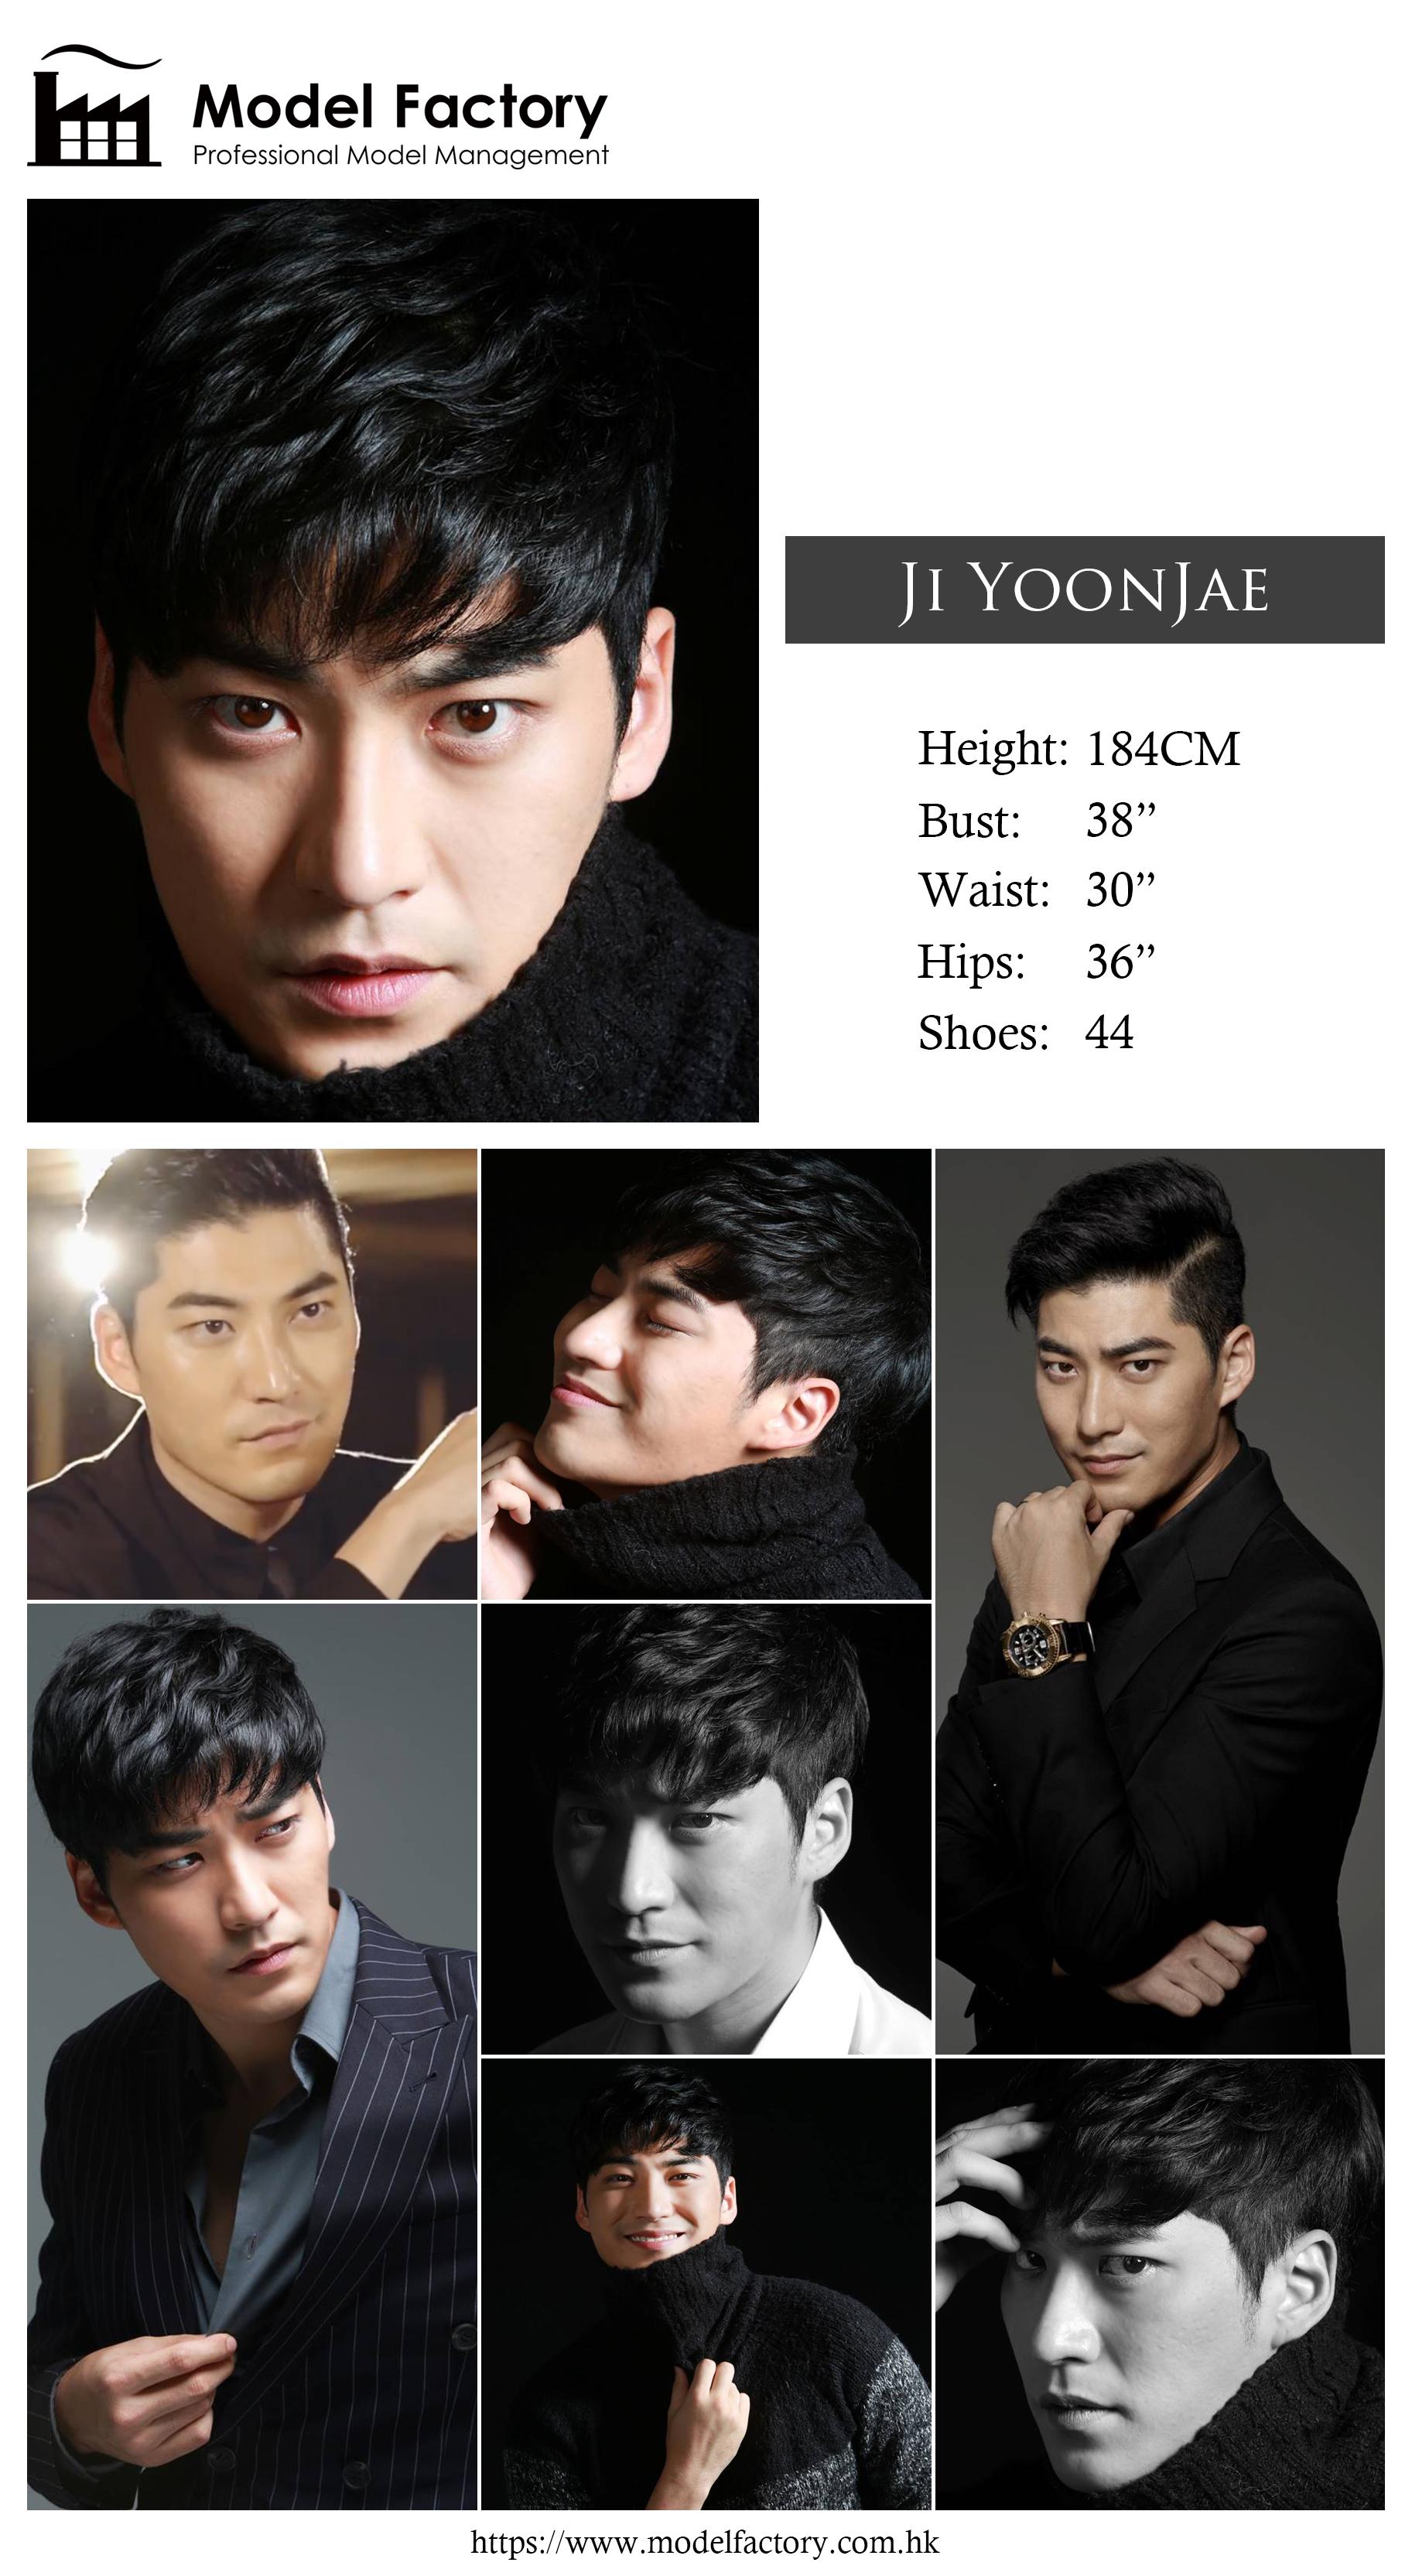 Model Factory Korean Male Model JiYoonJae